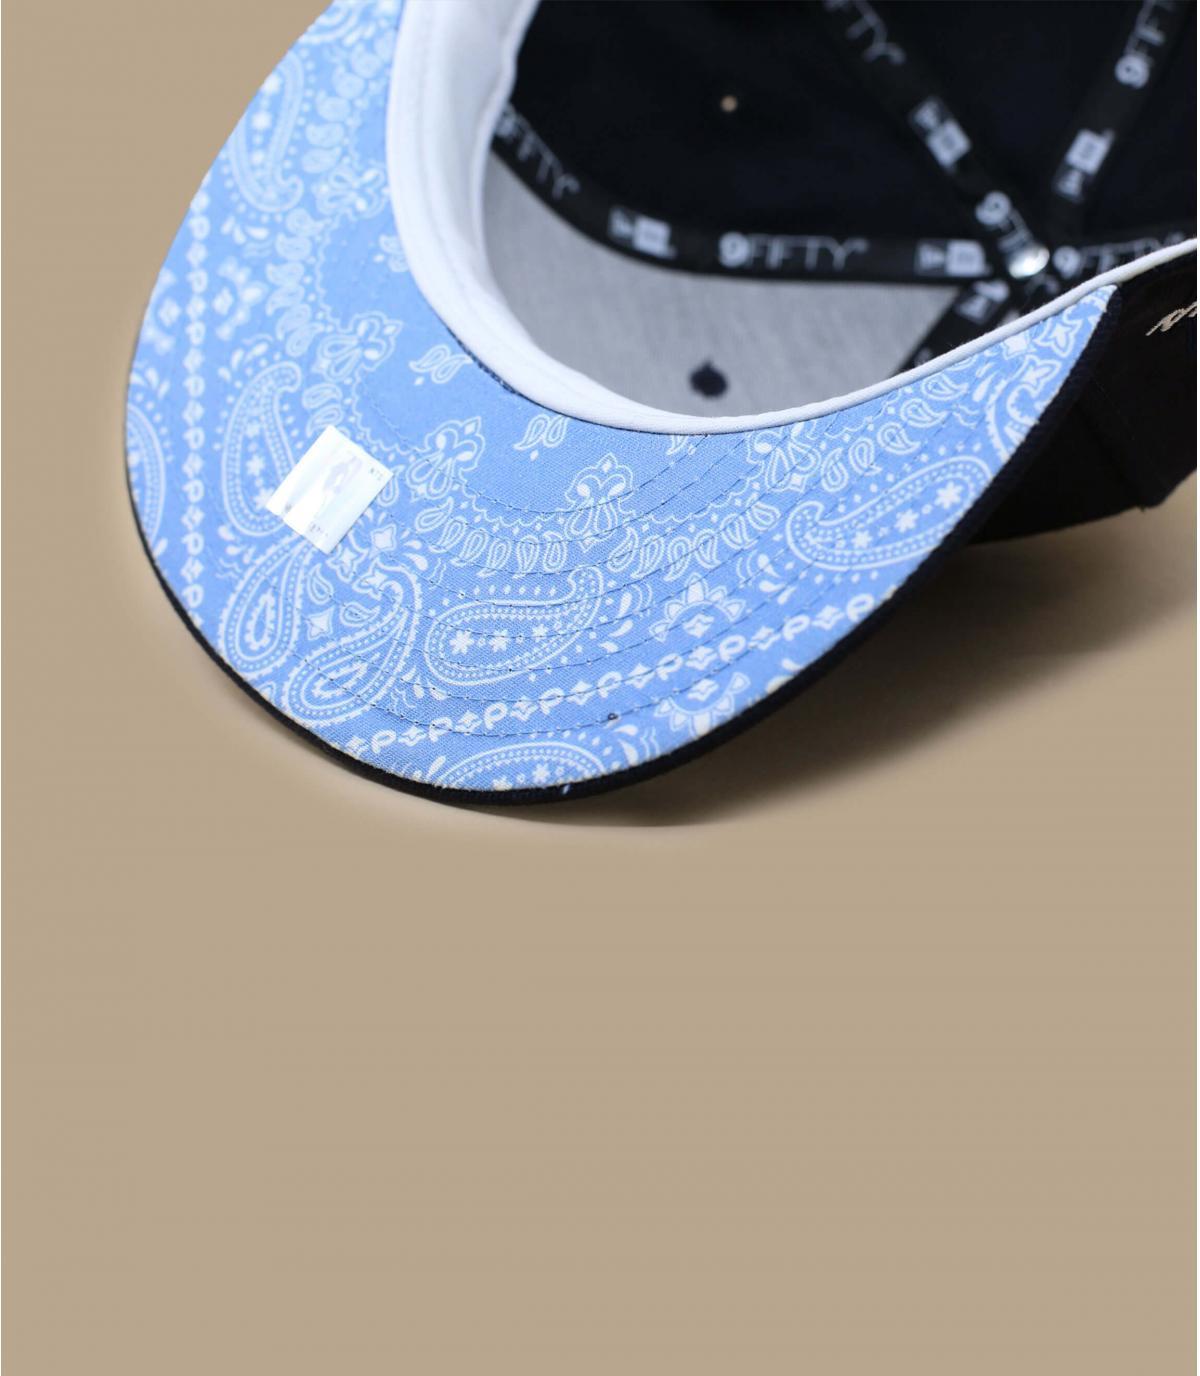 Détails Snapback Quickturn Paisley Bulls 950 navy sky blue - image 5